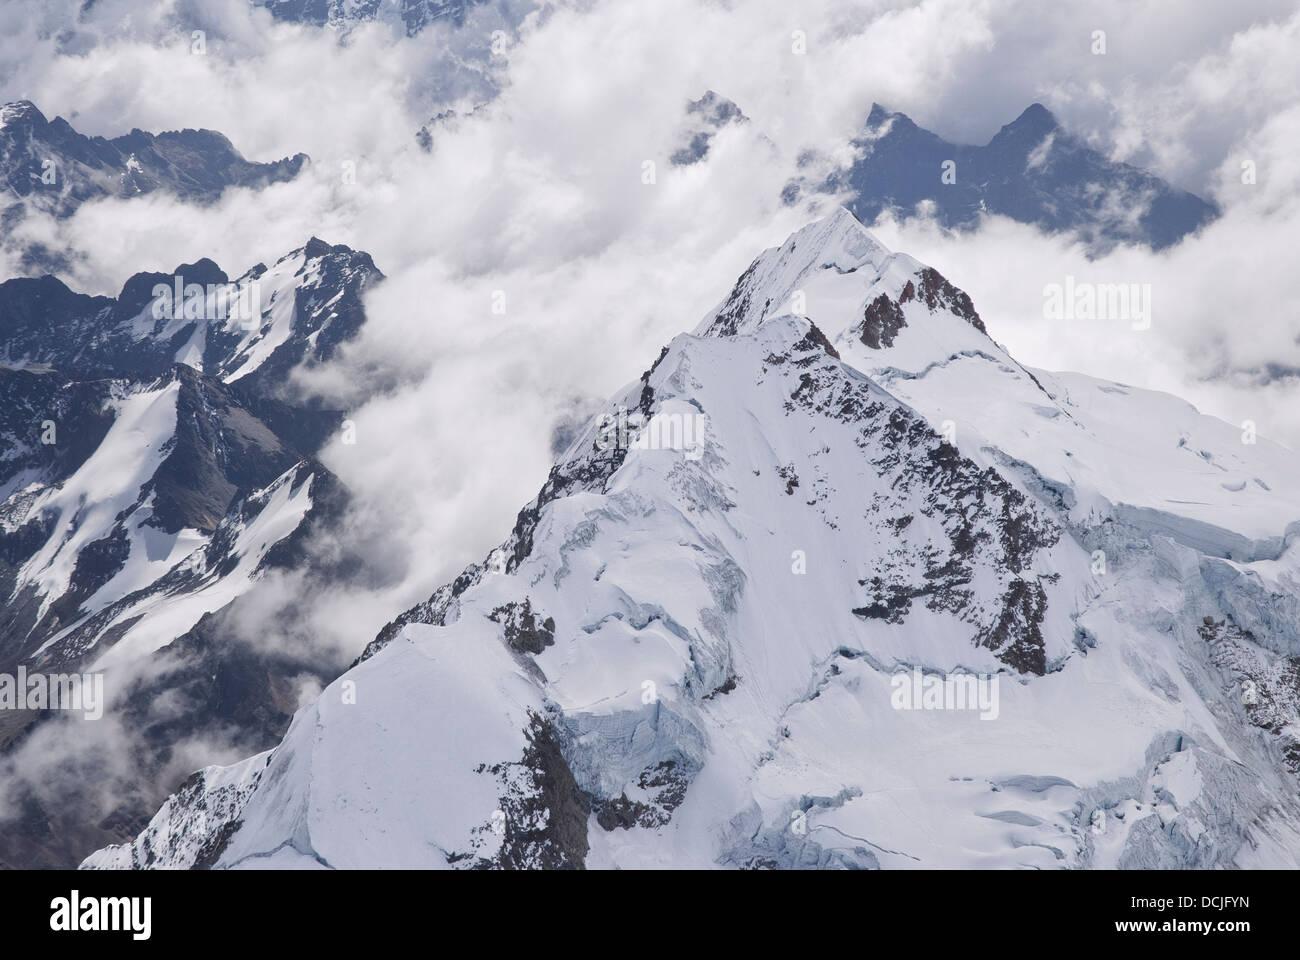 Aerial view of the mountain Huayna Potosi - Stock Image